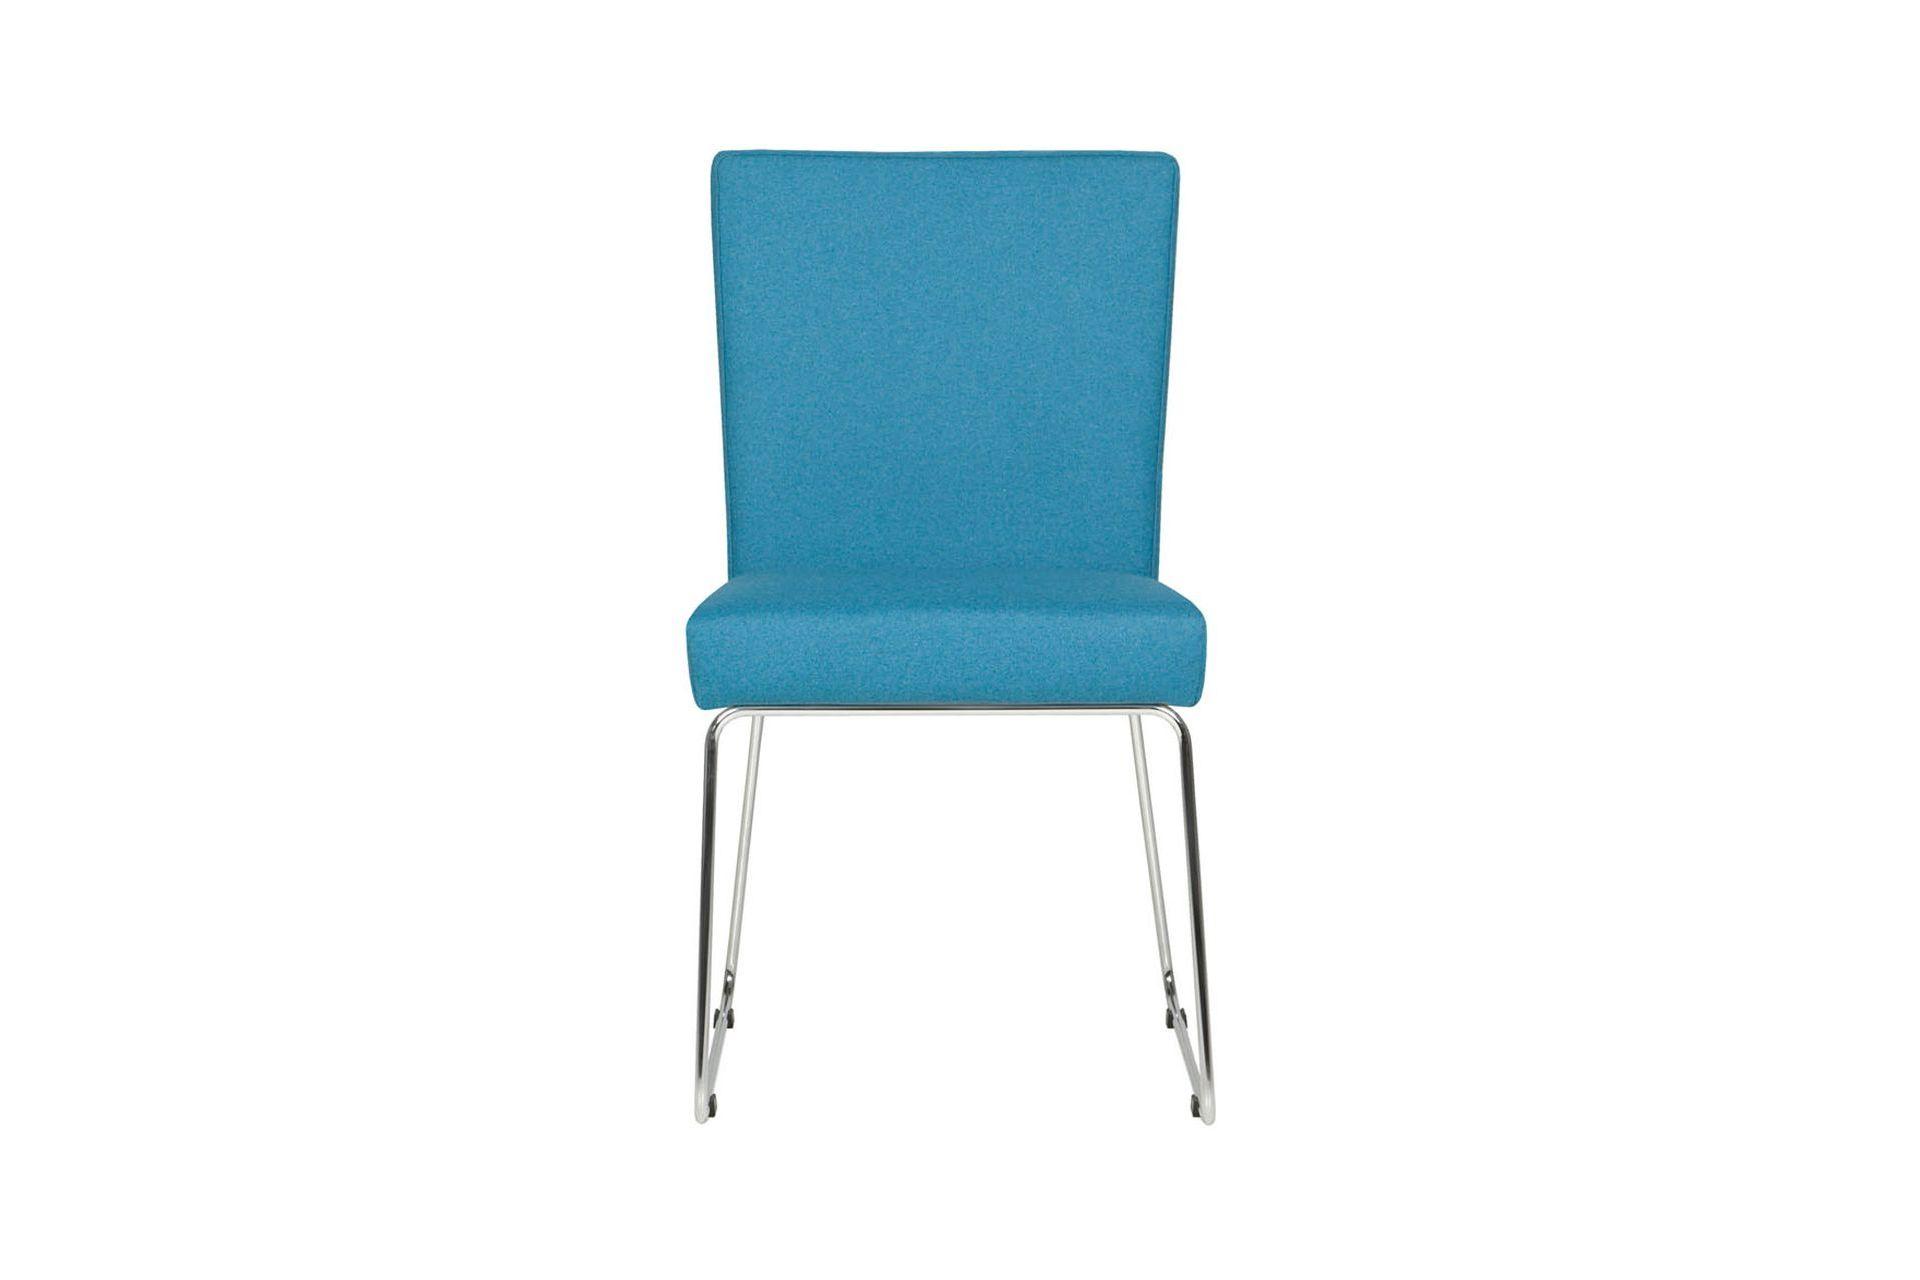 Кухонный стул Sits 15448928 от thefurnish